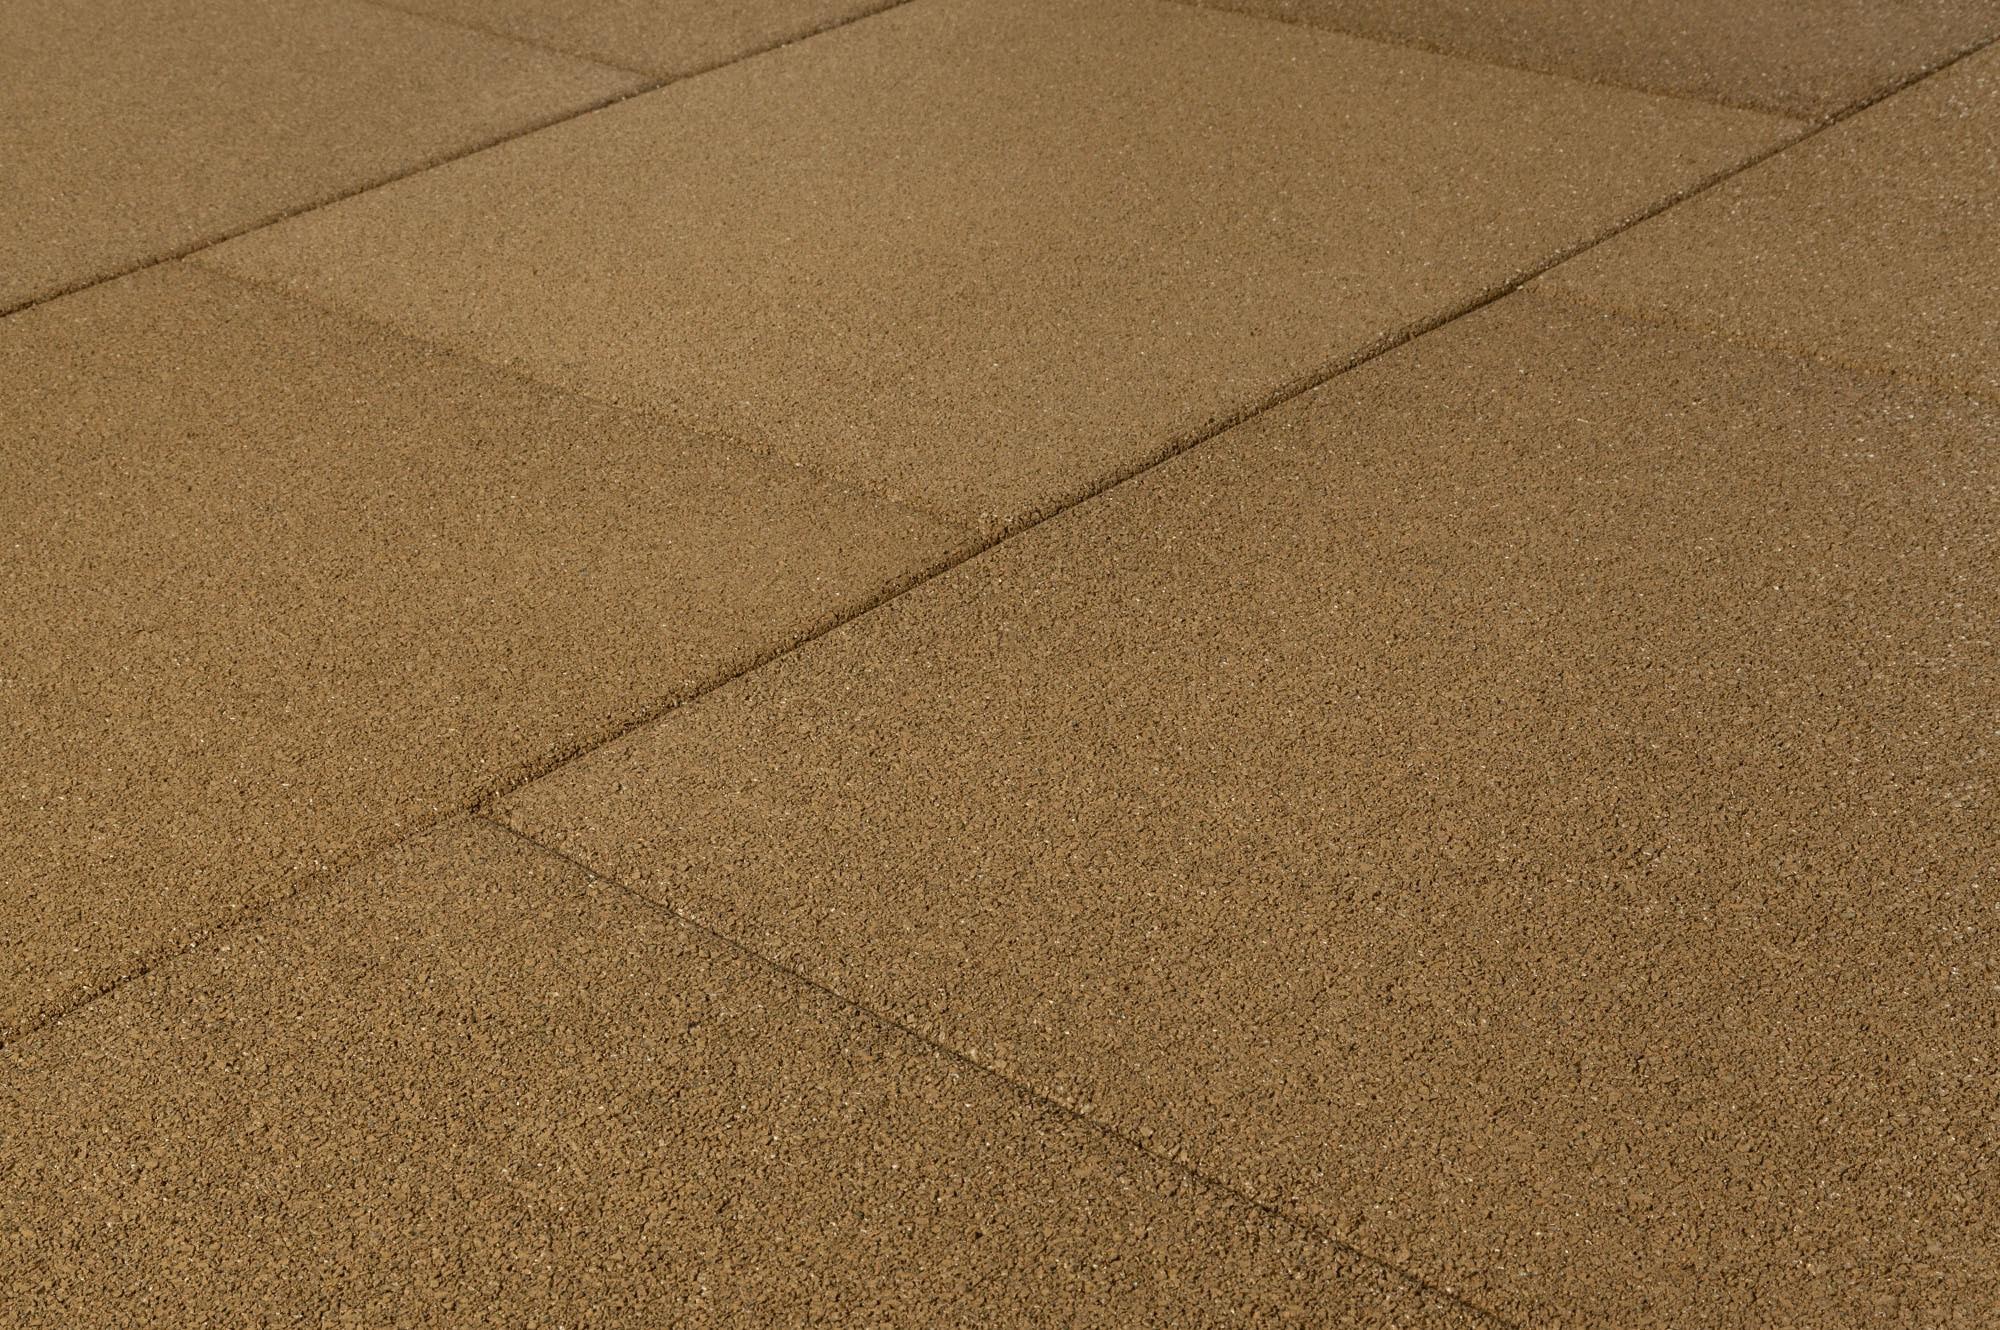 Brava outdoor interlocking rubber pavers beige pigment smooth 24 x24 x3 4 - How to install interlocking deck tiles ...